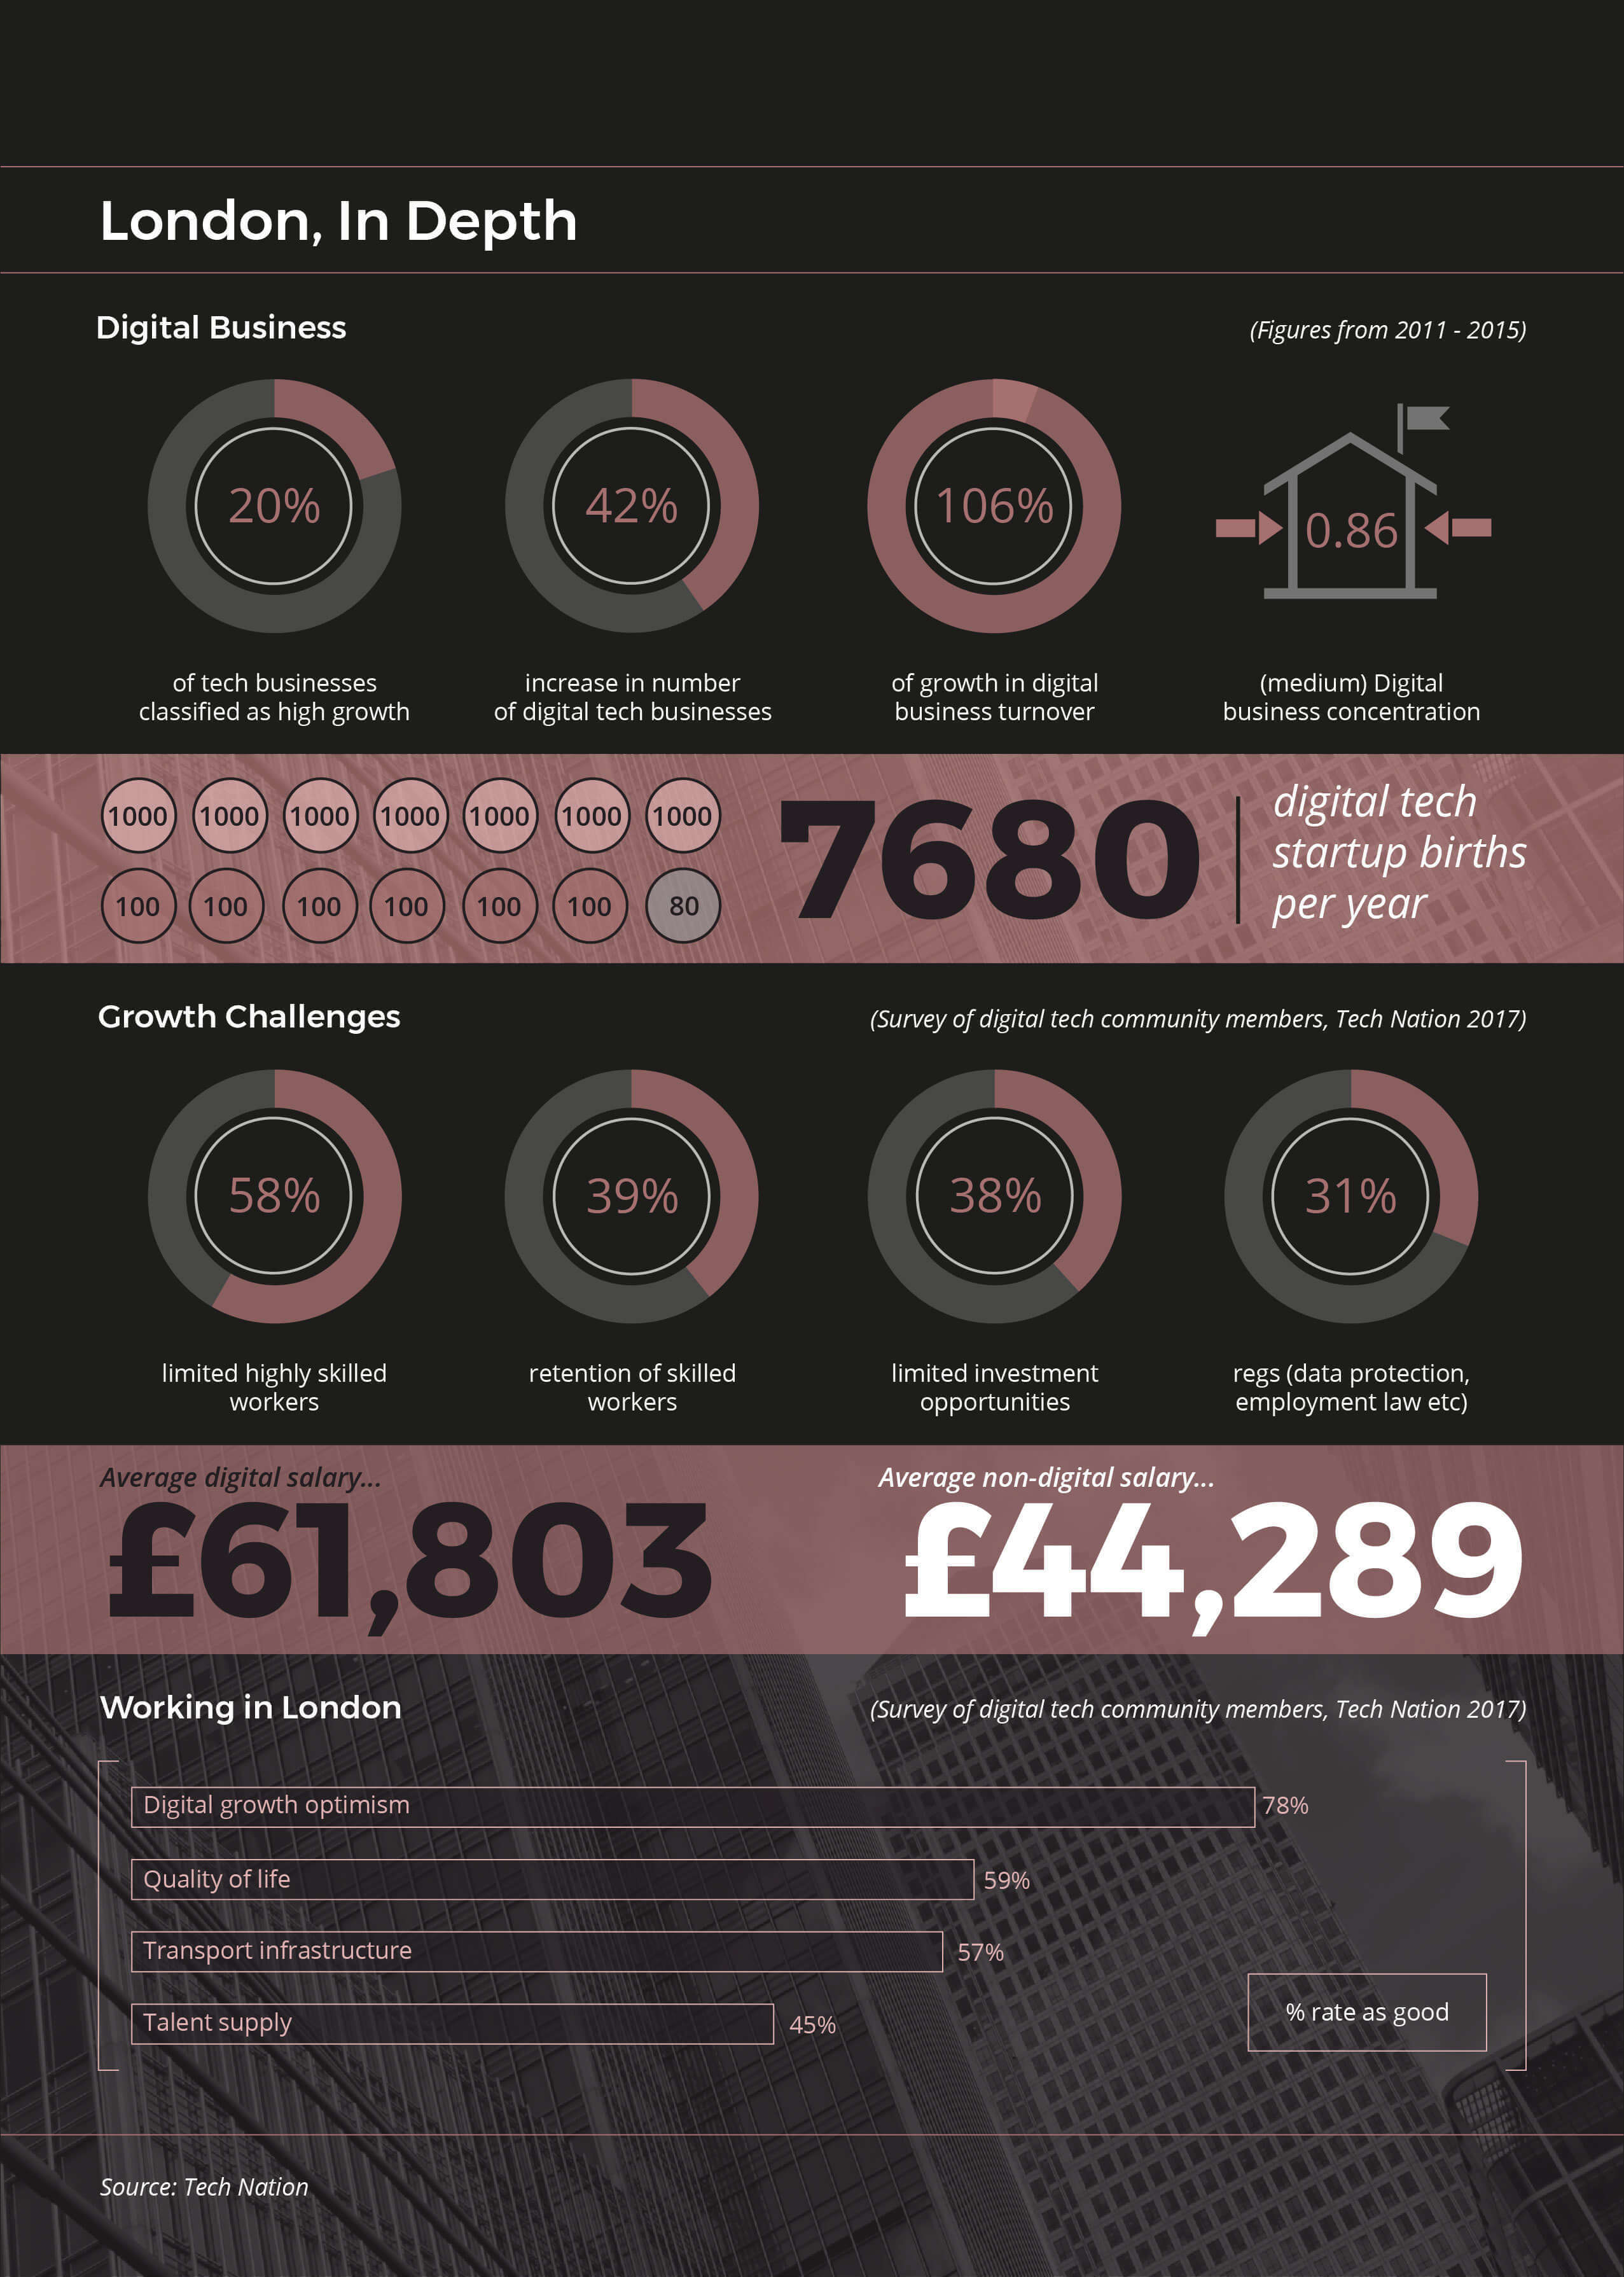 London Digital Economy - In Depth